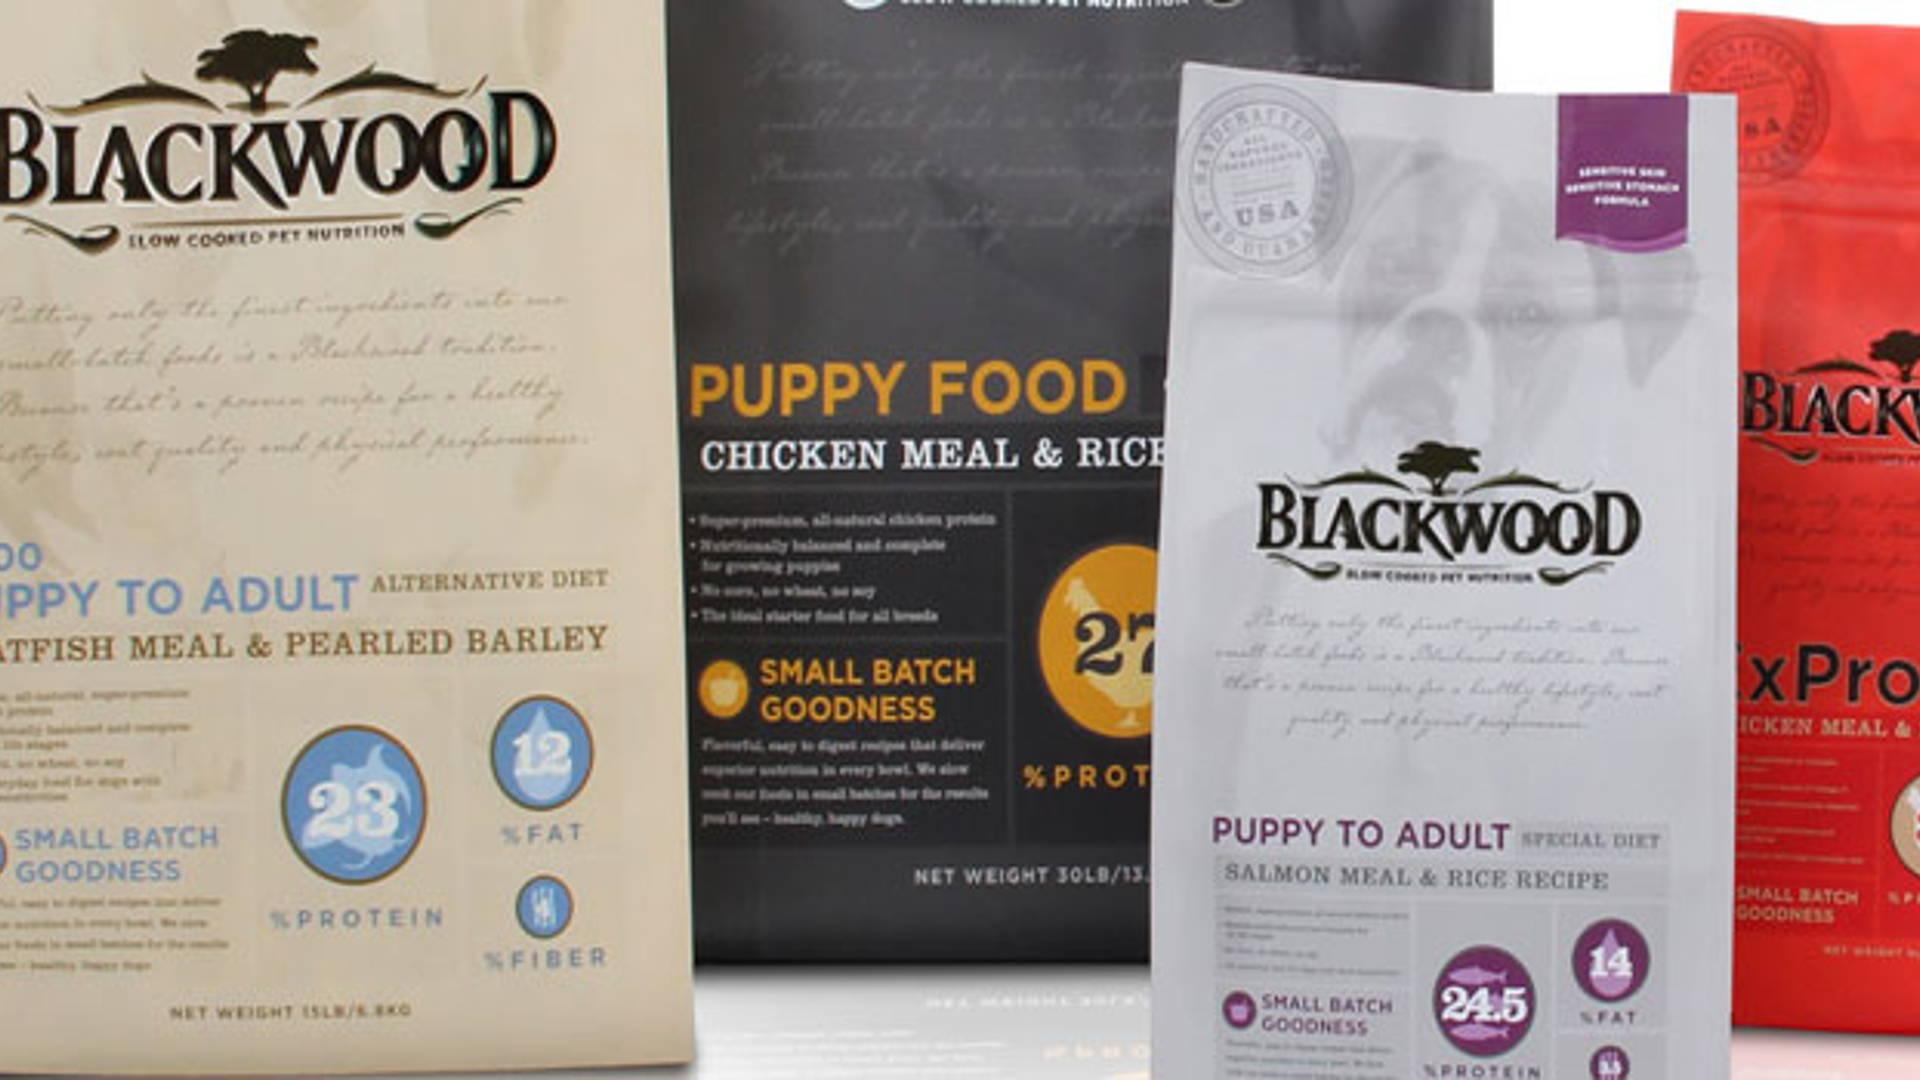 Blackwood Pet Food Dieline Design Branding Packaging Inspiration